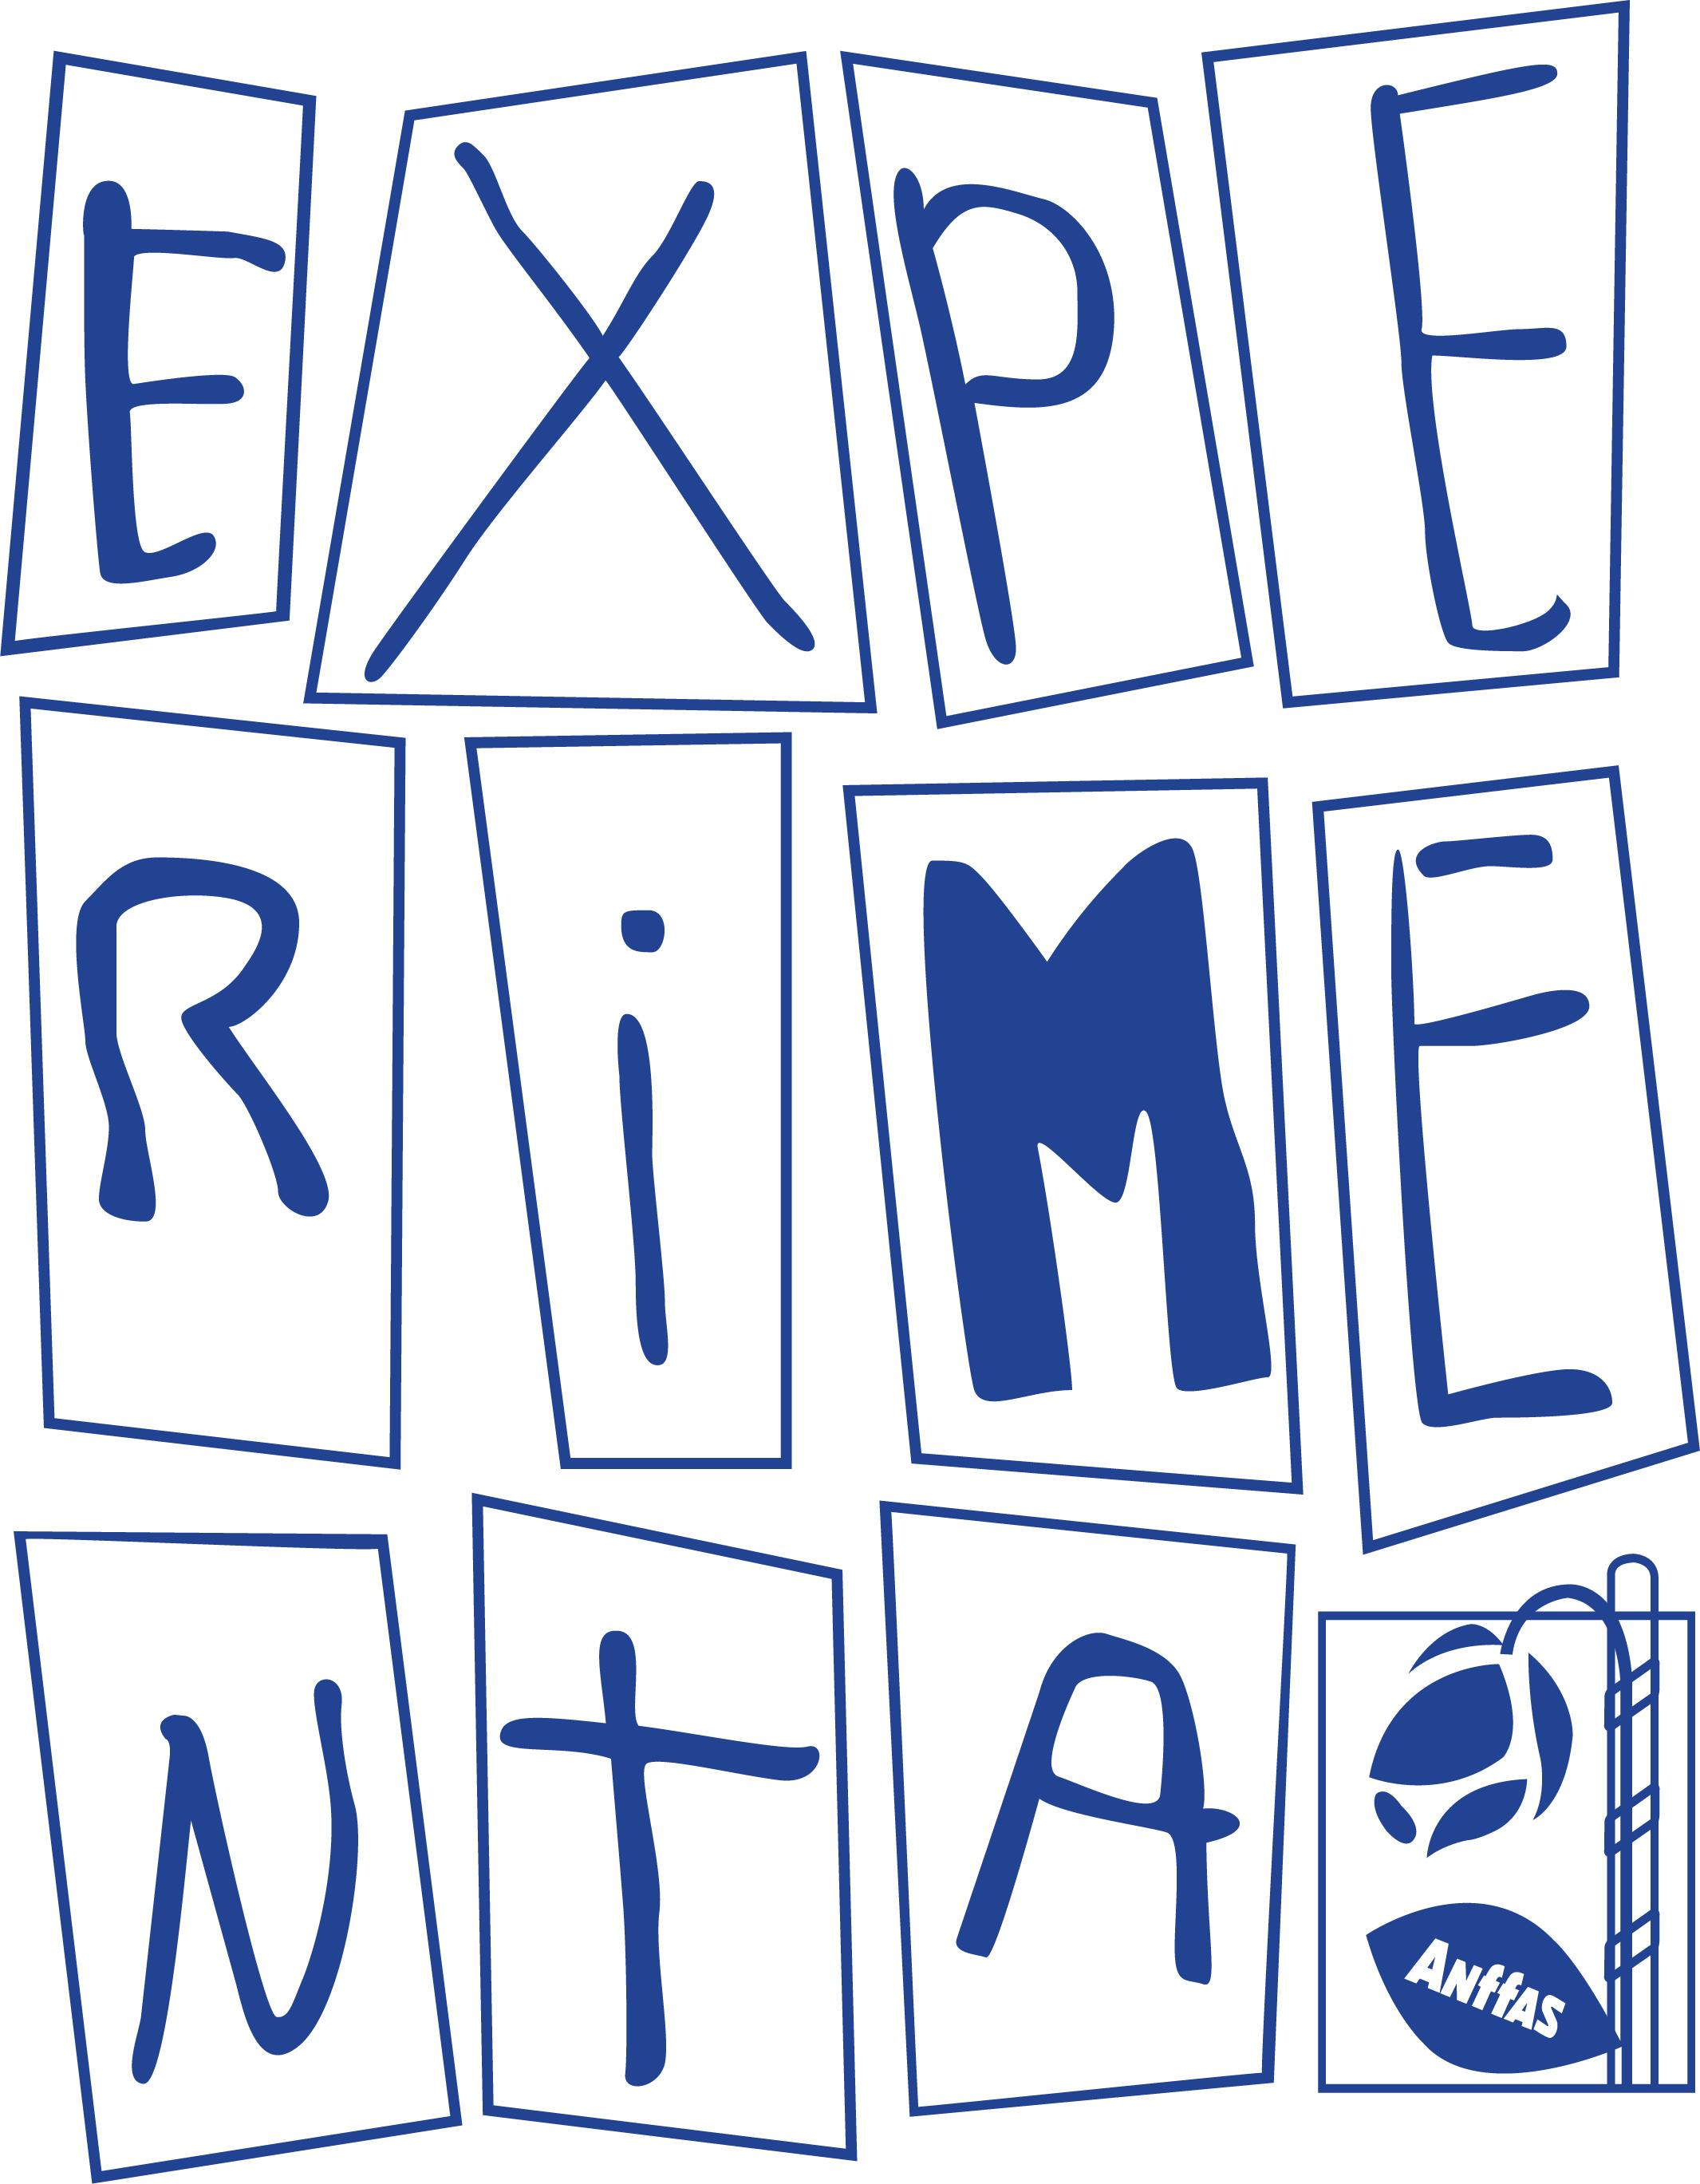 Logo-Experimenta.jpg